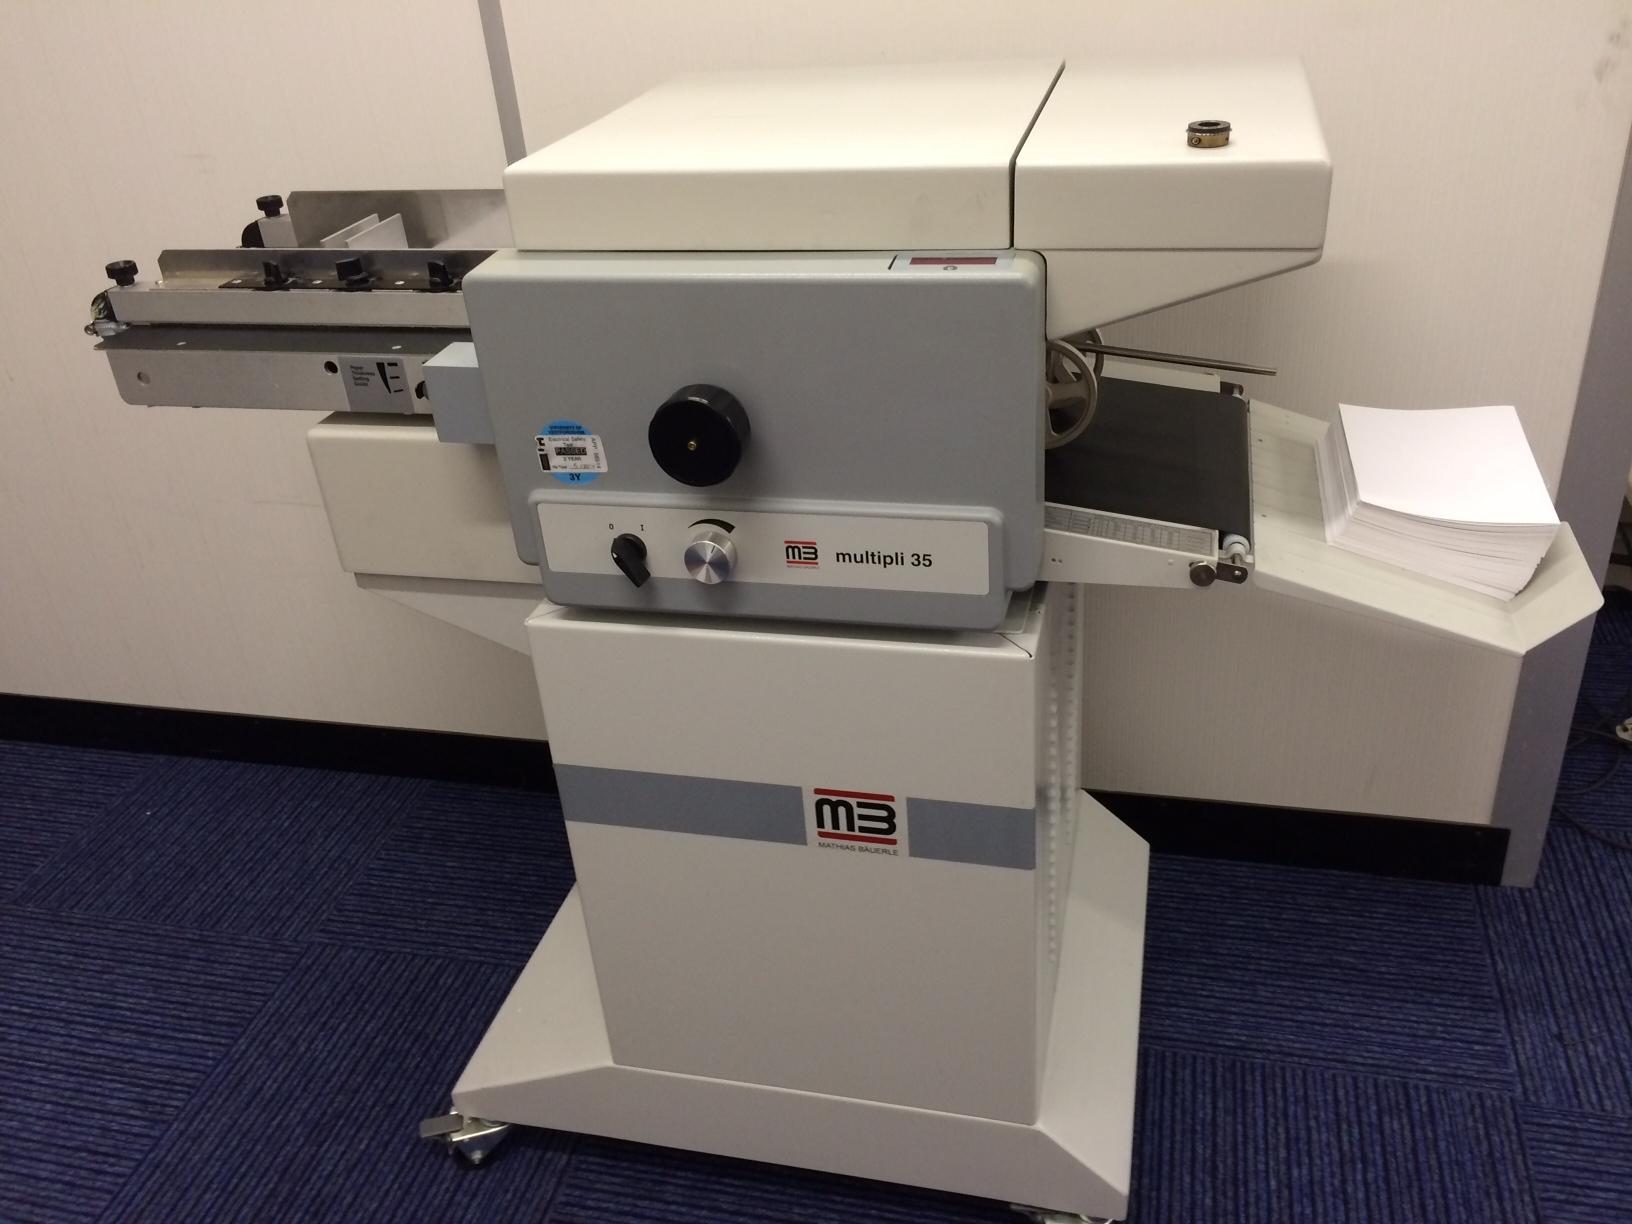 MB Multipli 35 Folding Machine